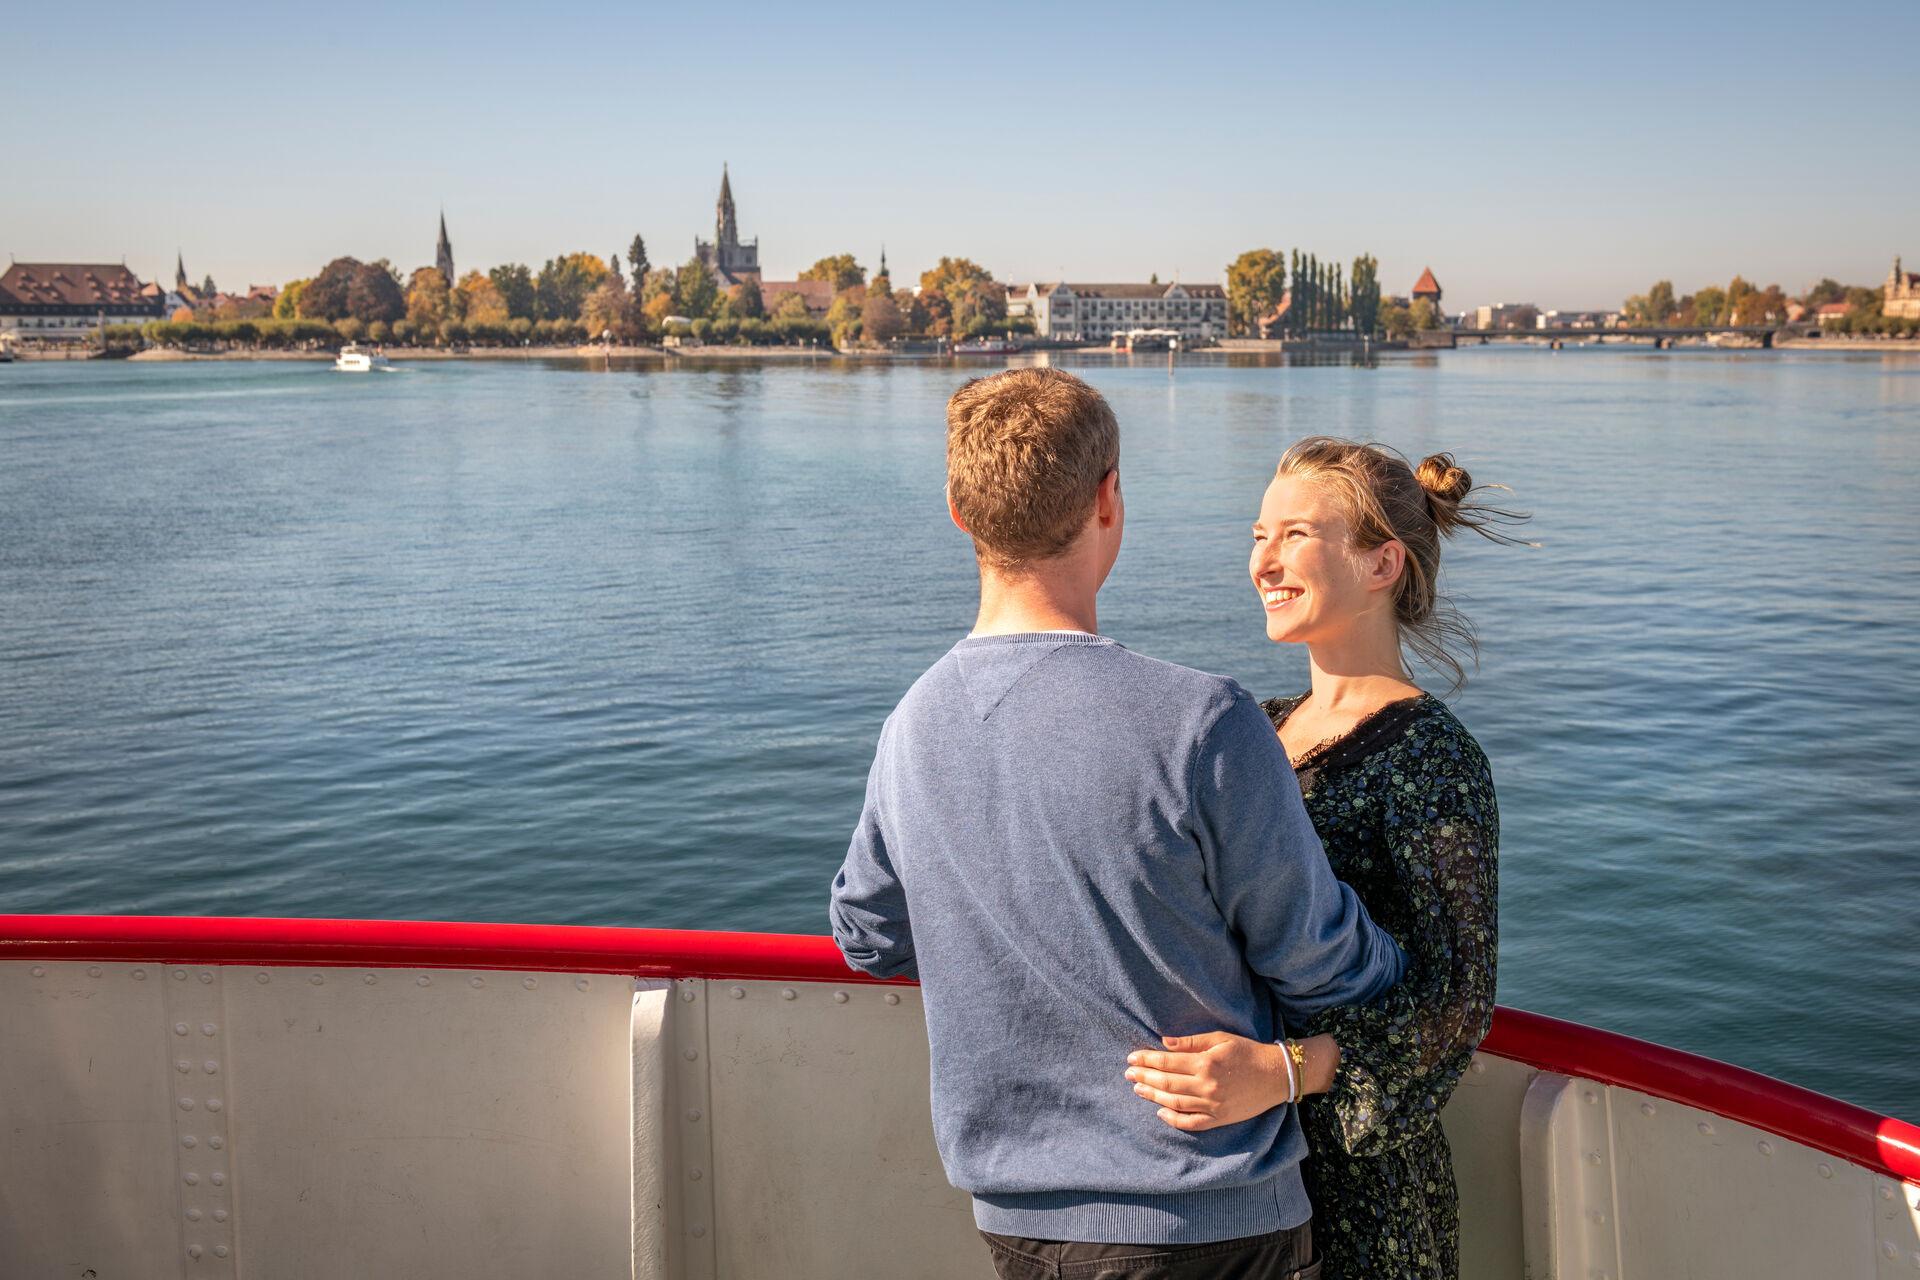 Konstanz-Bodensee-Schifffahrt-BSB-Ausflug-Liebespaar-Deck-Blick-auf-Muenster-04_Herbst_Copyright_MTK-Dagmar-Schwelle